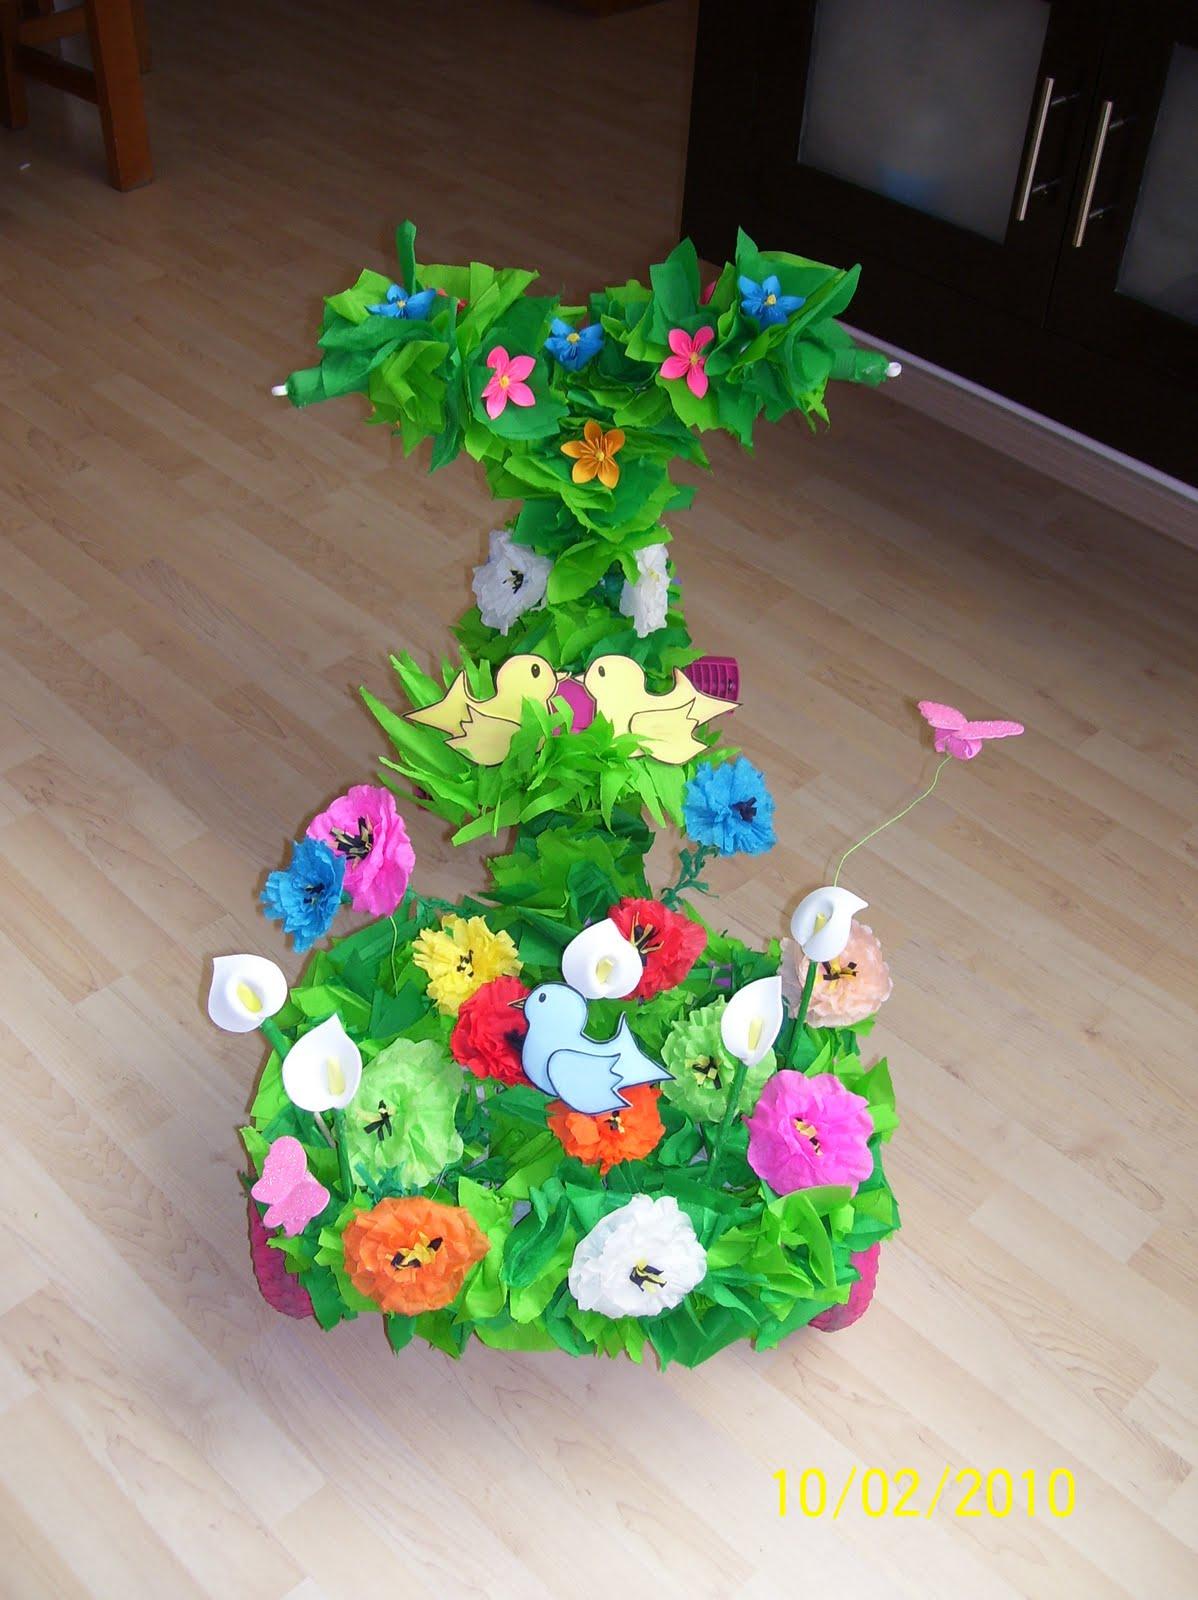 Monys monadas decoraci n de triciclos primavera for Decoracion primavera infantil